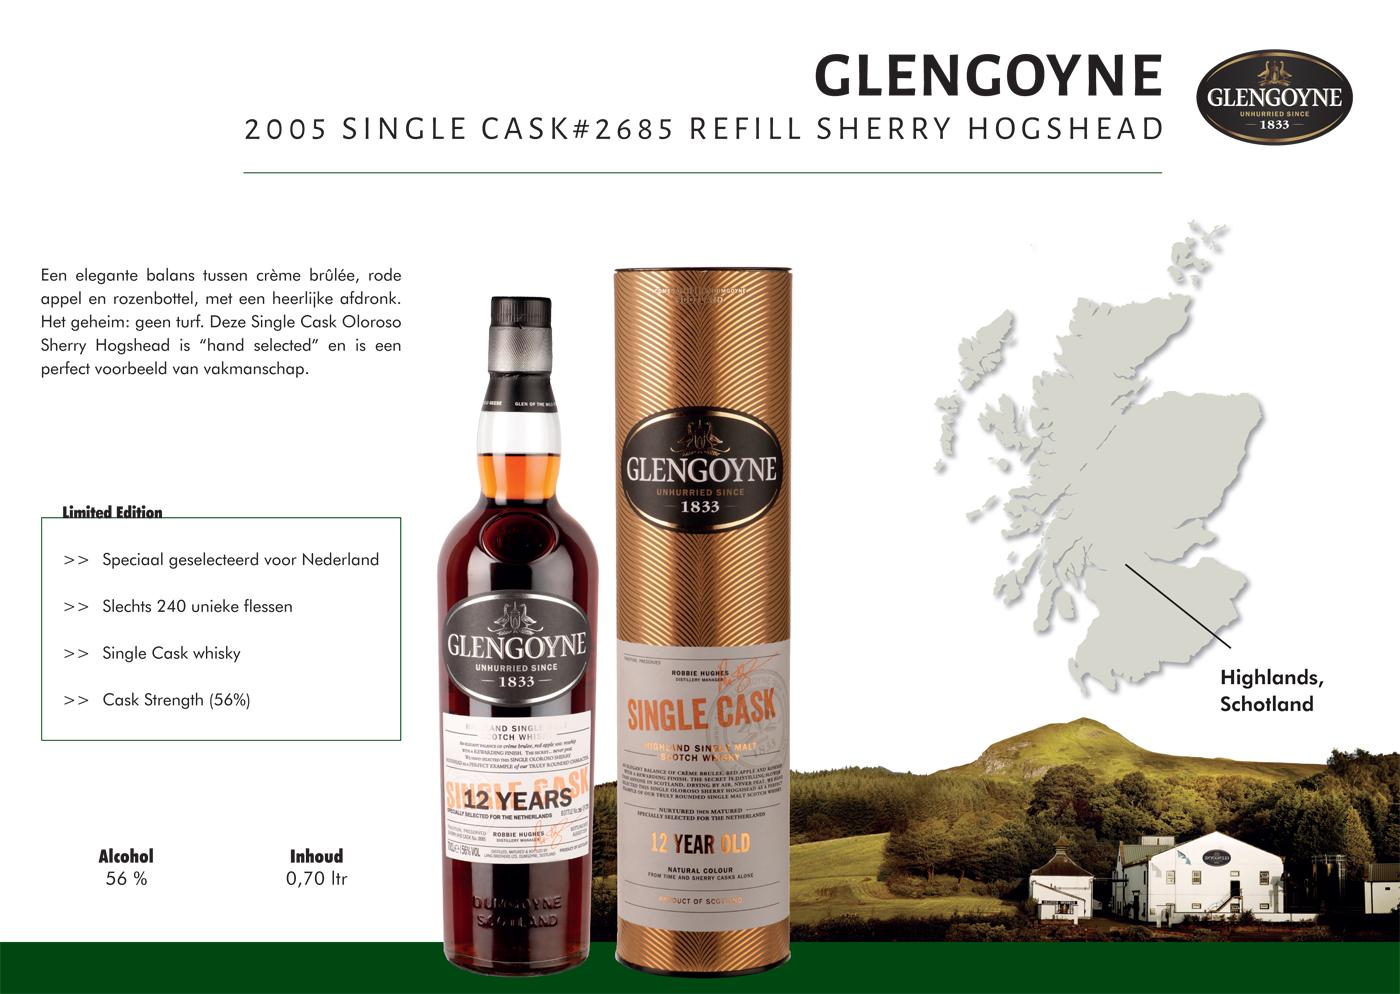 Lancering Glengoyne 2005# Single Cask Refill Sherry Hogshead tijdens het 100-jarig jubileum